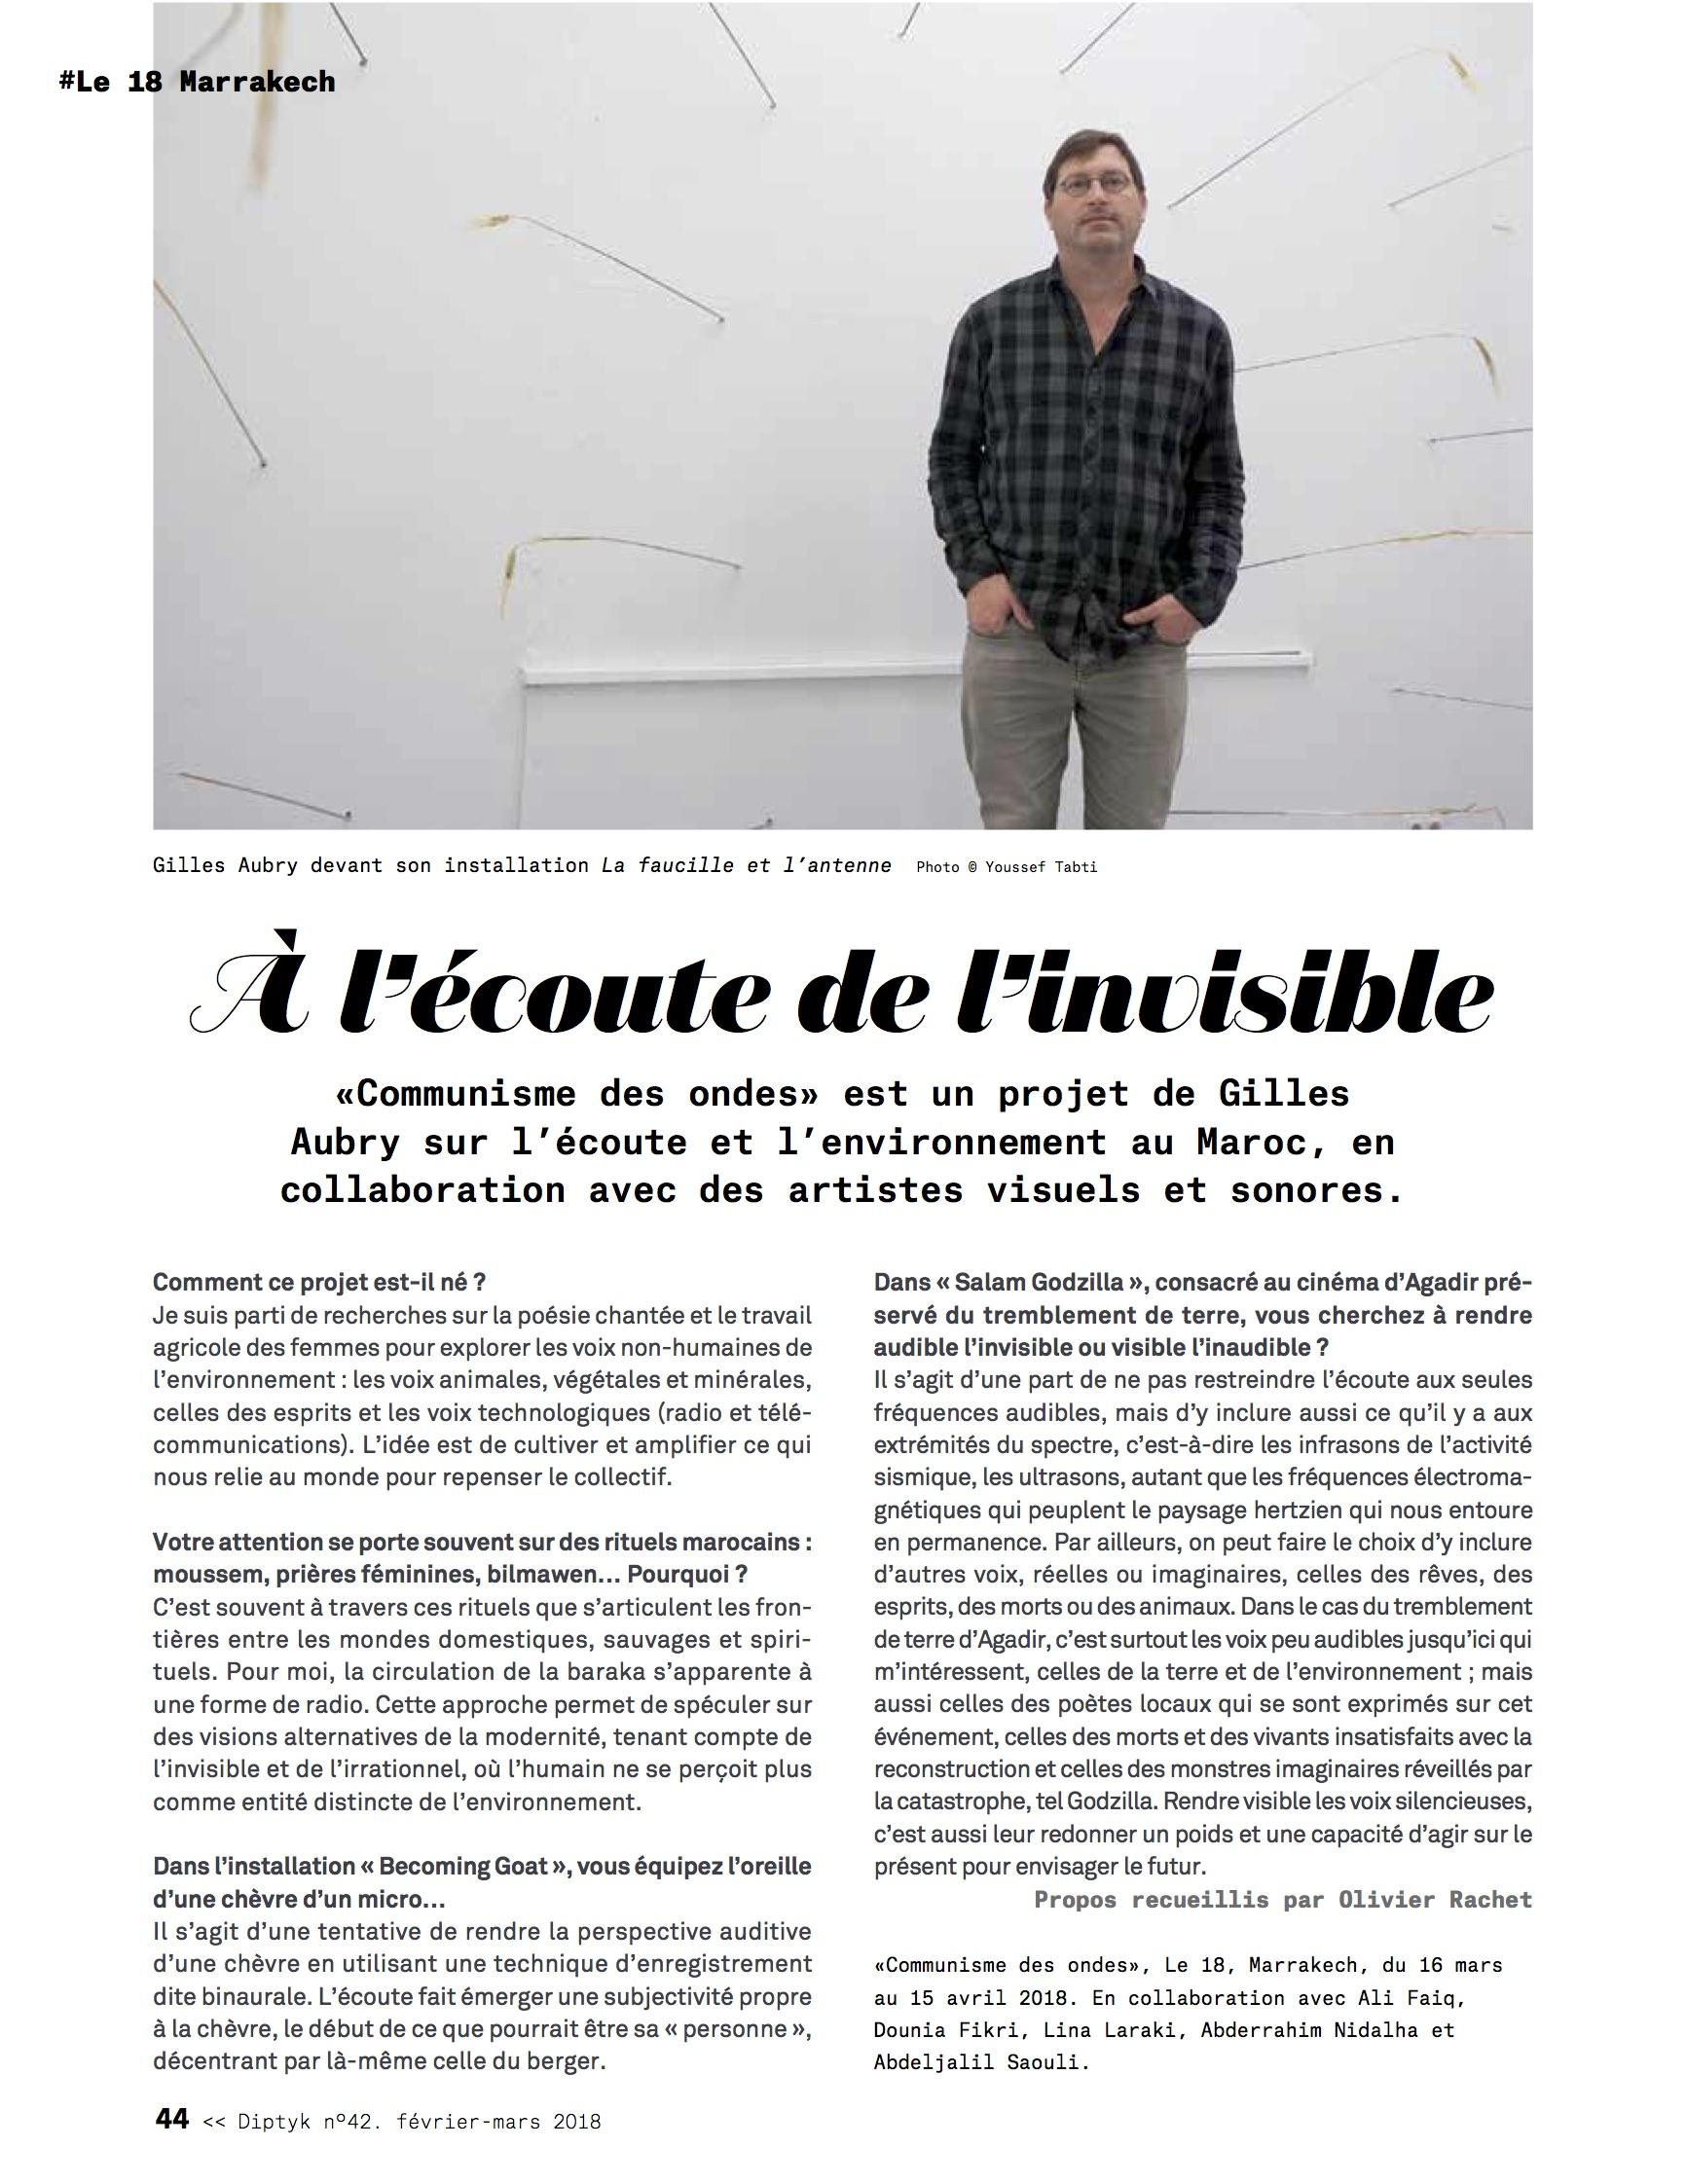 earpolitics net » Interview in Diptyk art magazine, February